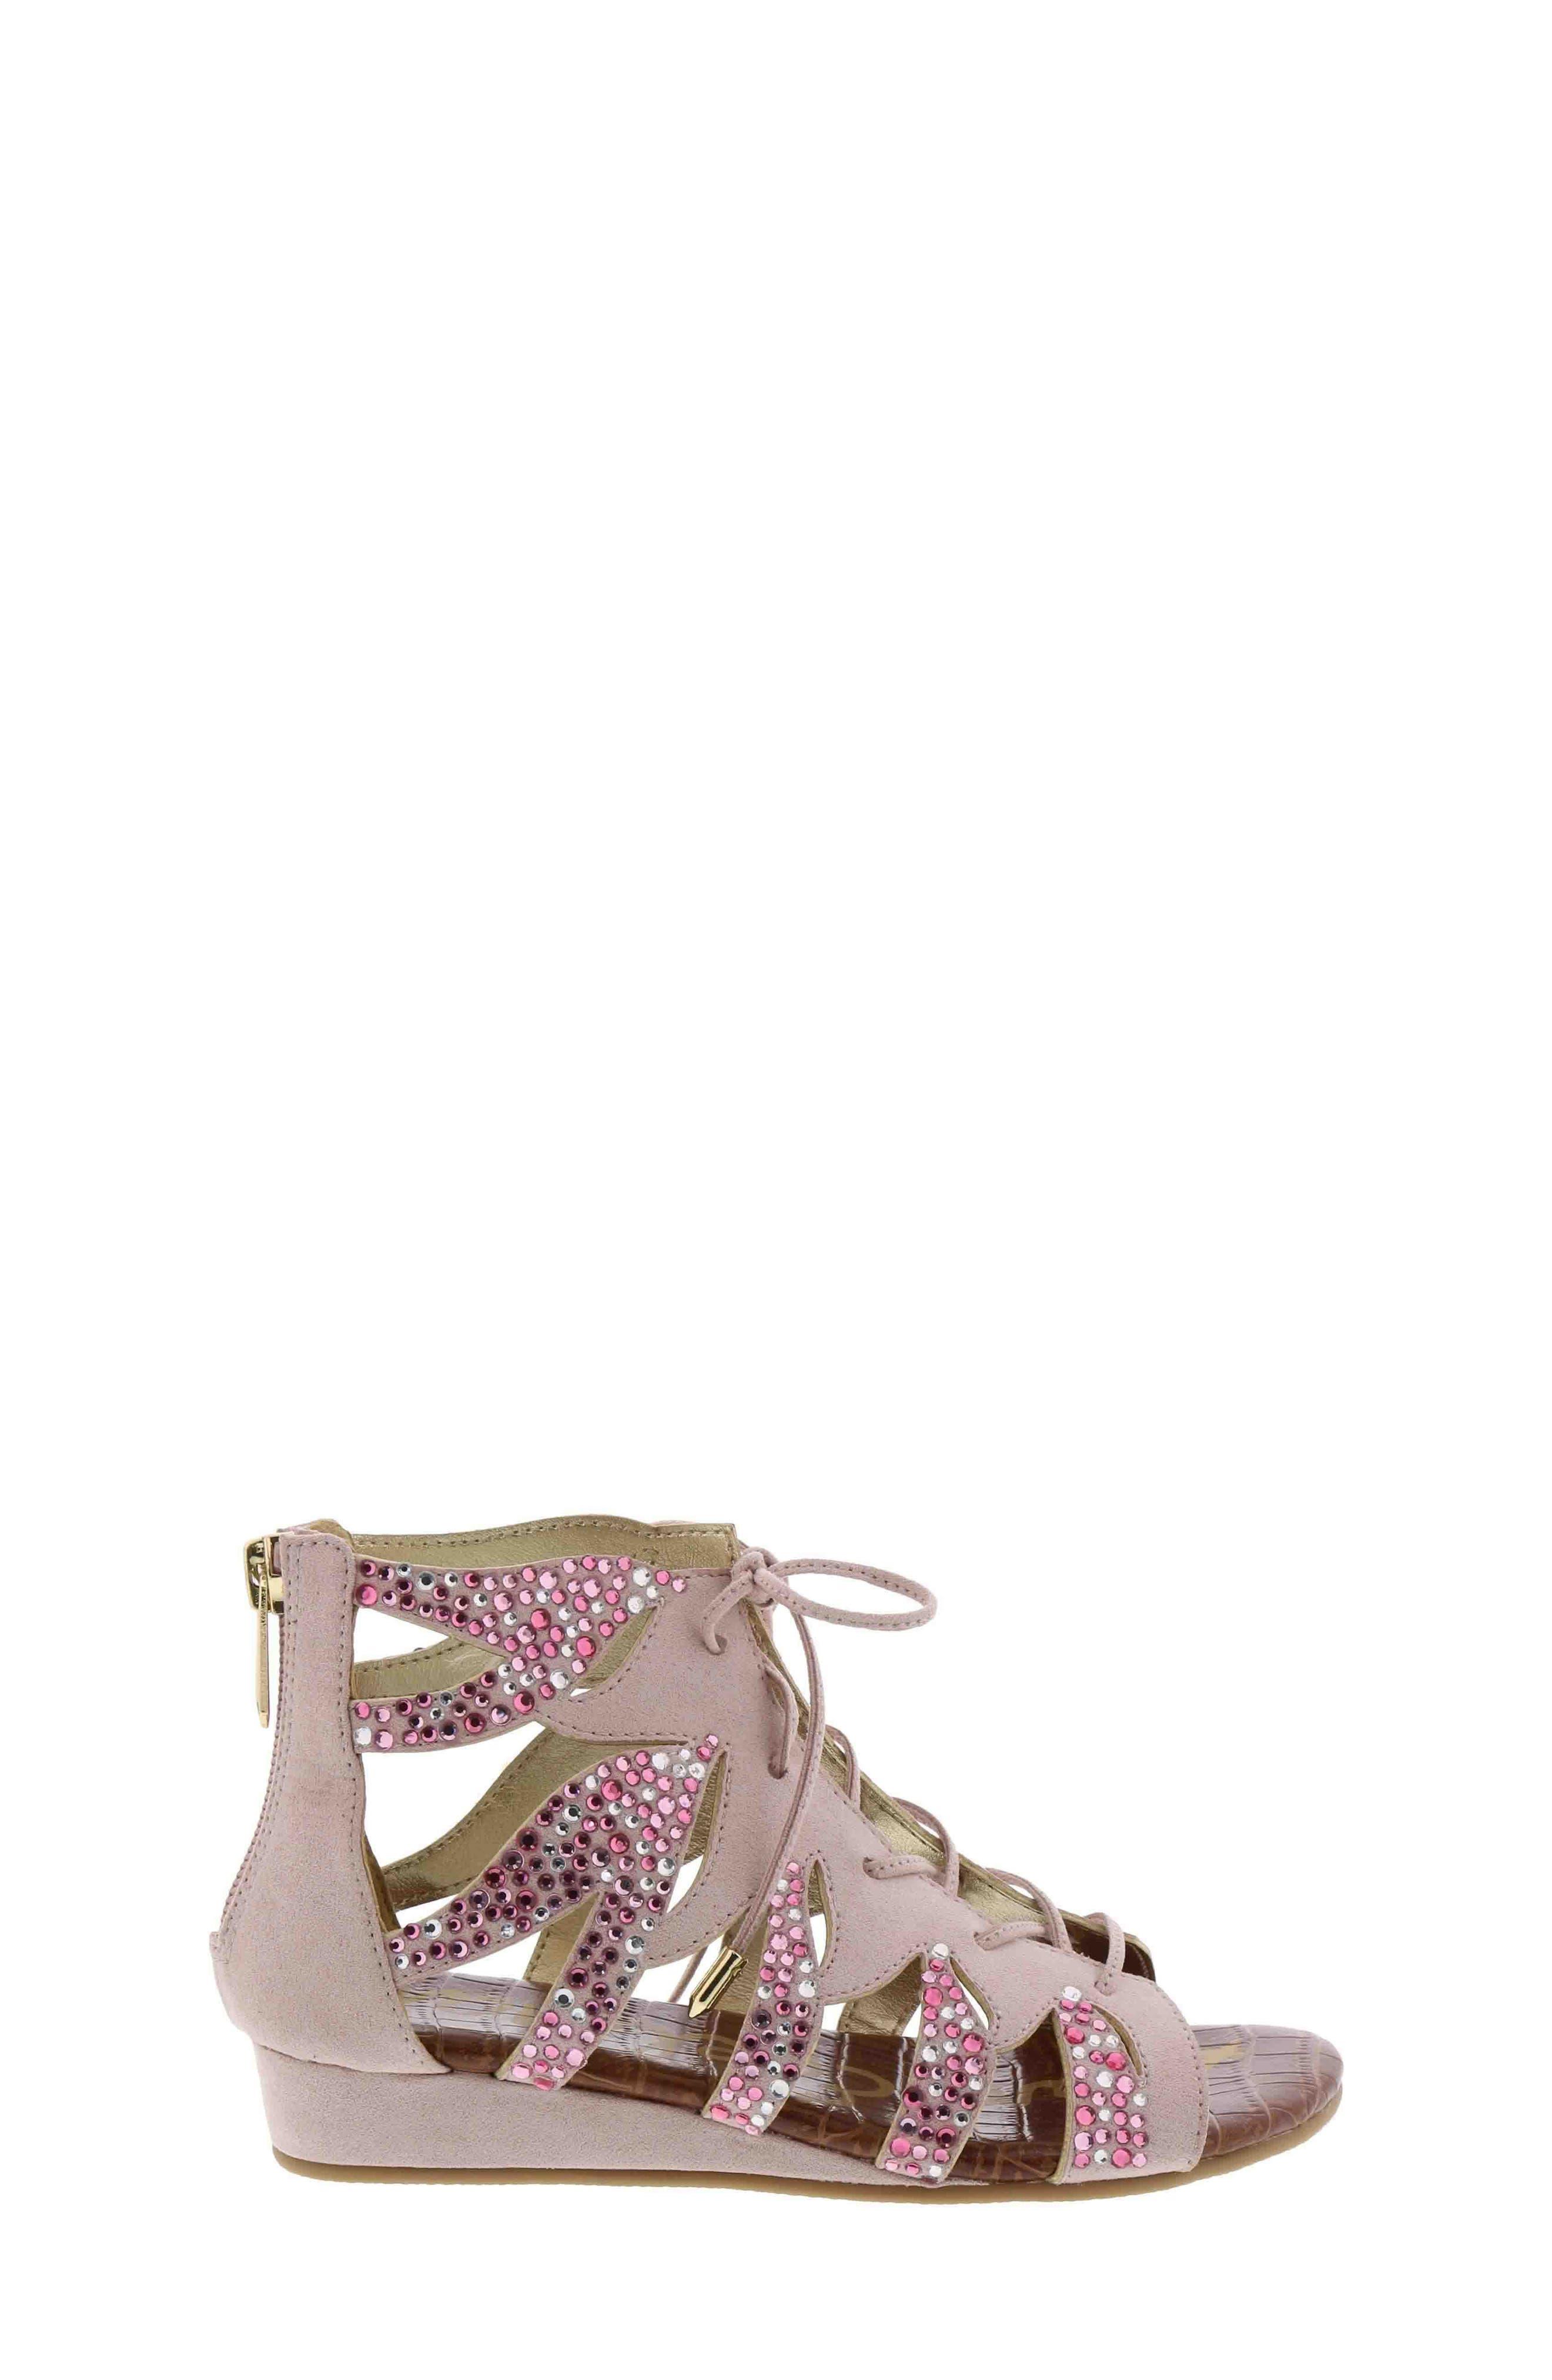 Danica Crystal Embellished Sandal,                             Main thumbnail 1, color,                             Blush Faux Suede